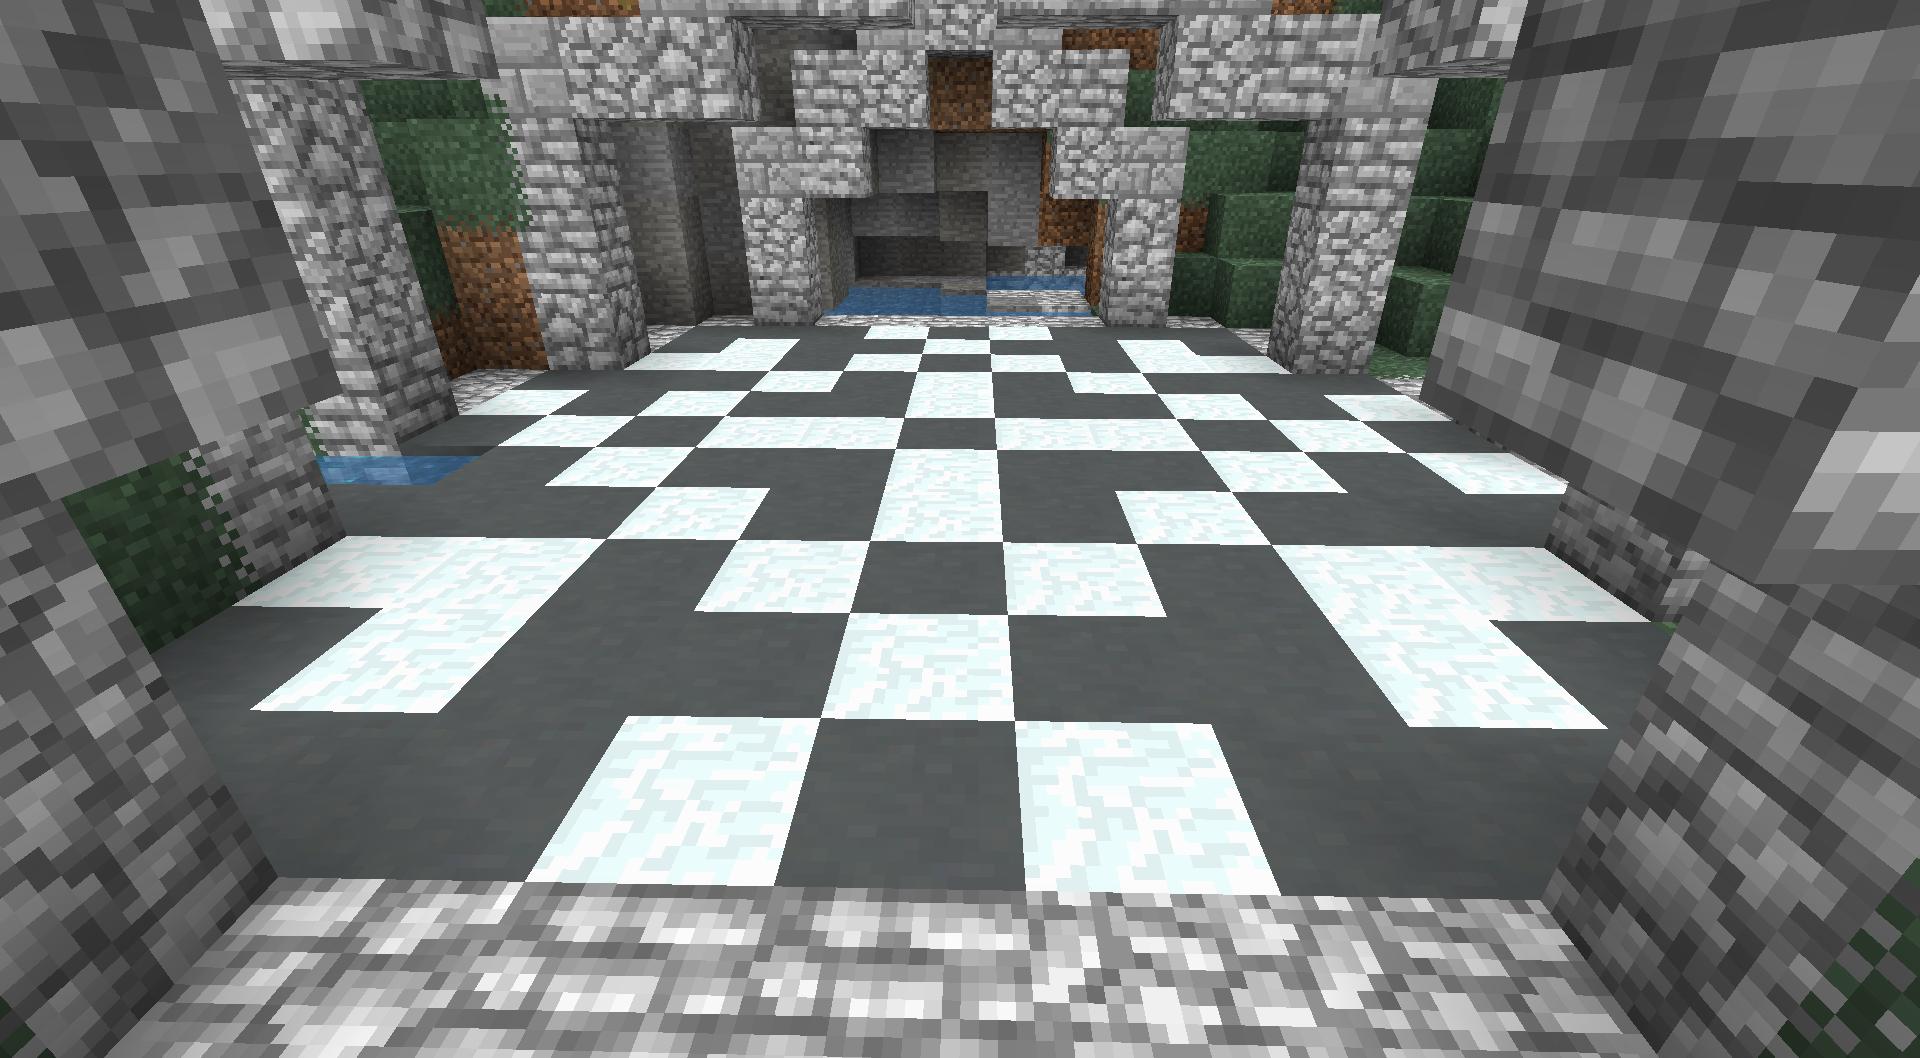 Snowflake without glazed terracotta